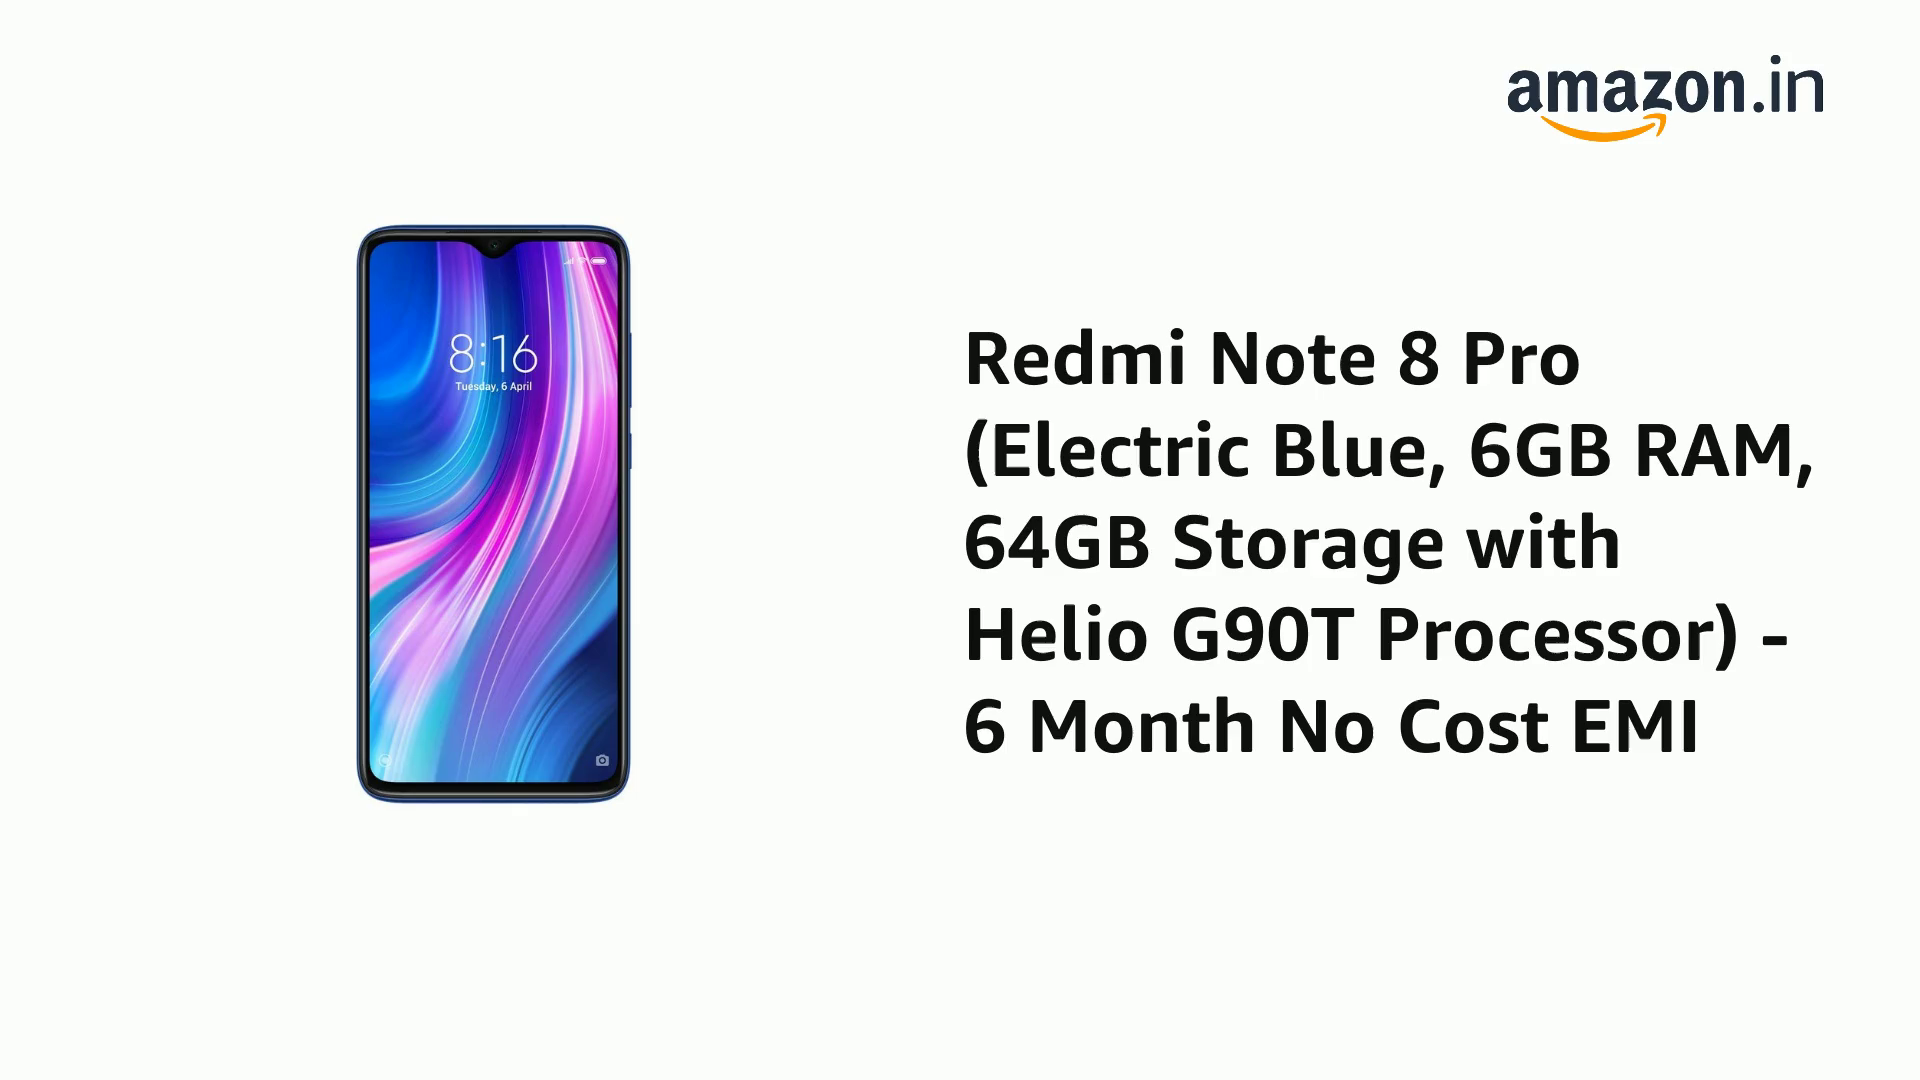 Redmi Note 8 Pro (Halo White, 8GB RAM, 128GB Storage with Helio G90T Processor)